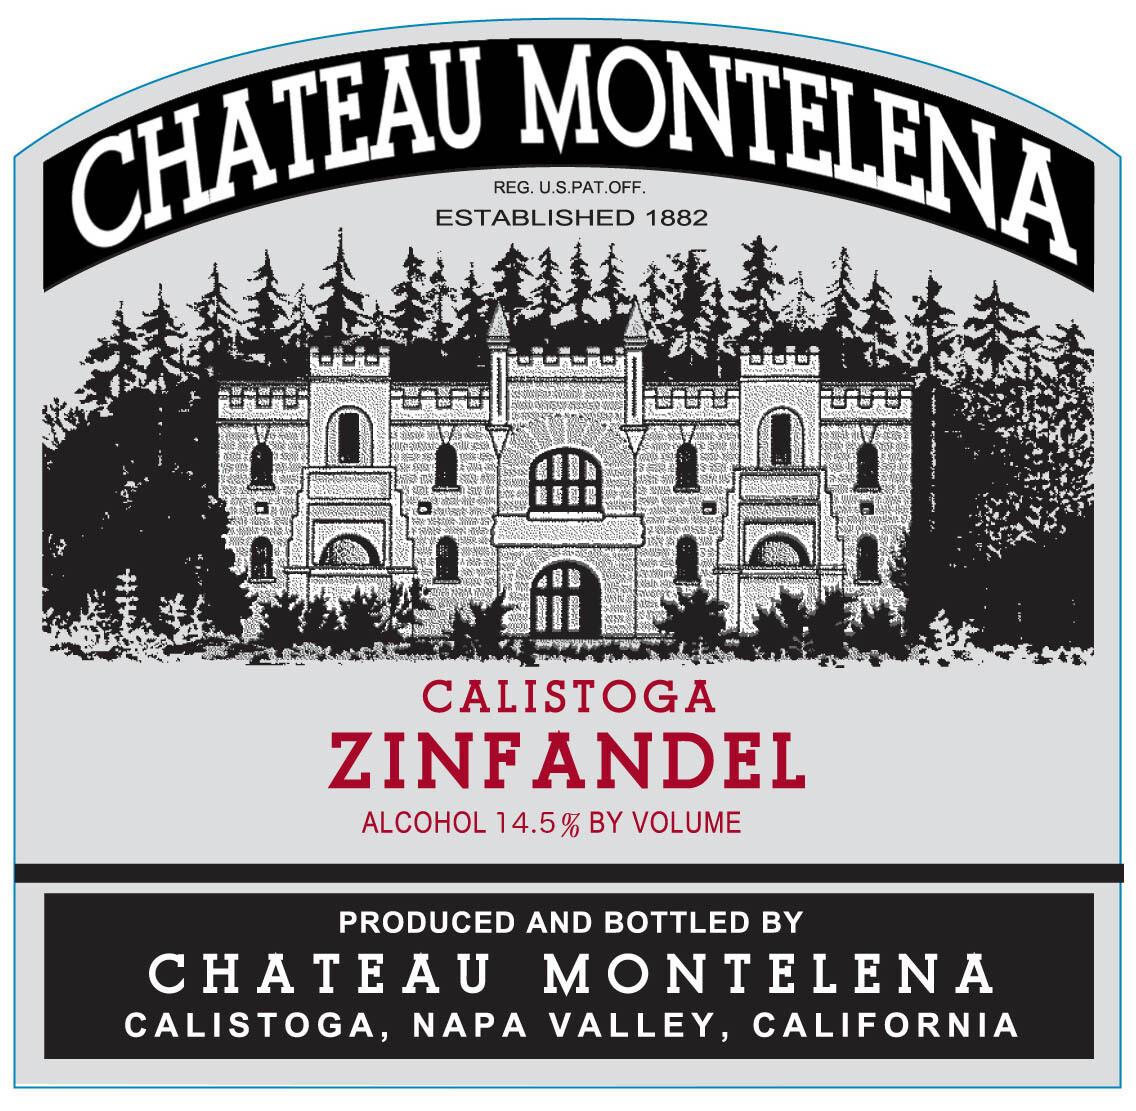 Chateau Montelena Zinfandel 2015 (MAG)